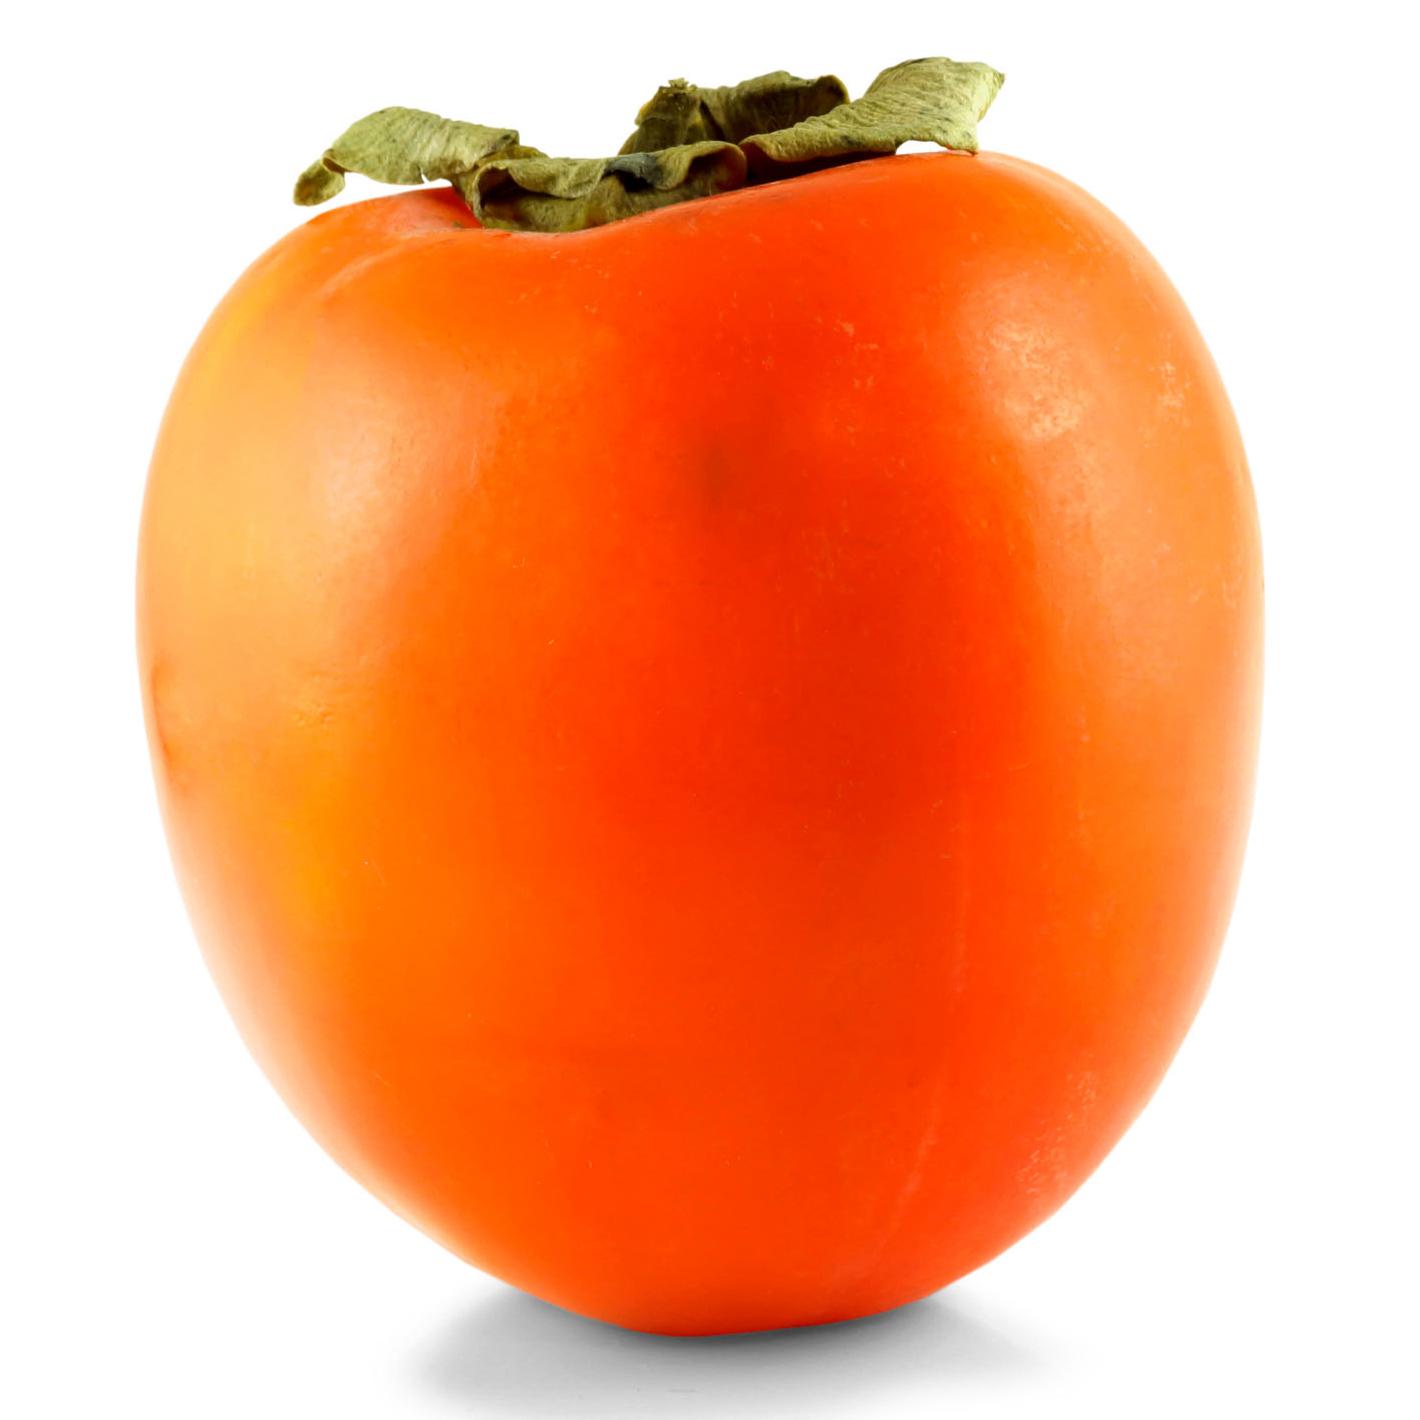 hachiya persimmon